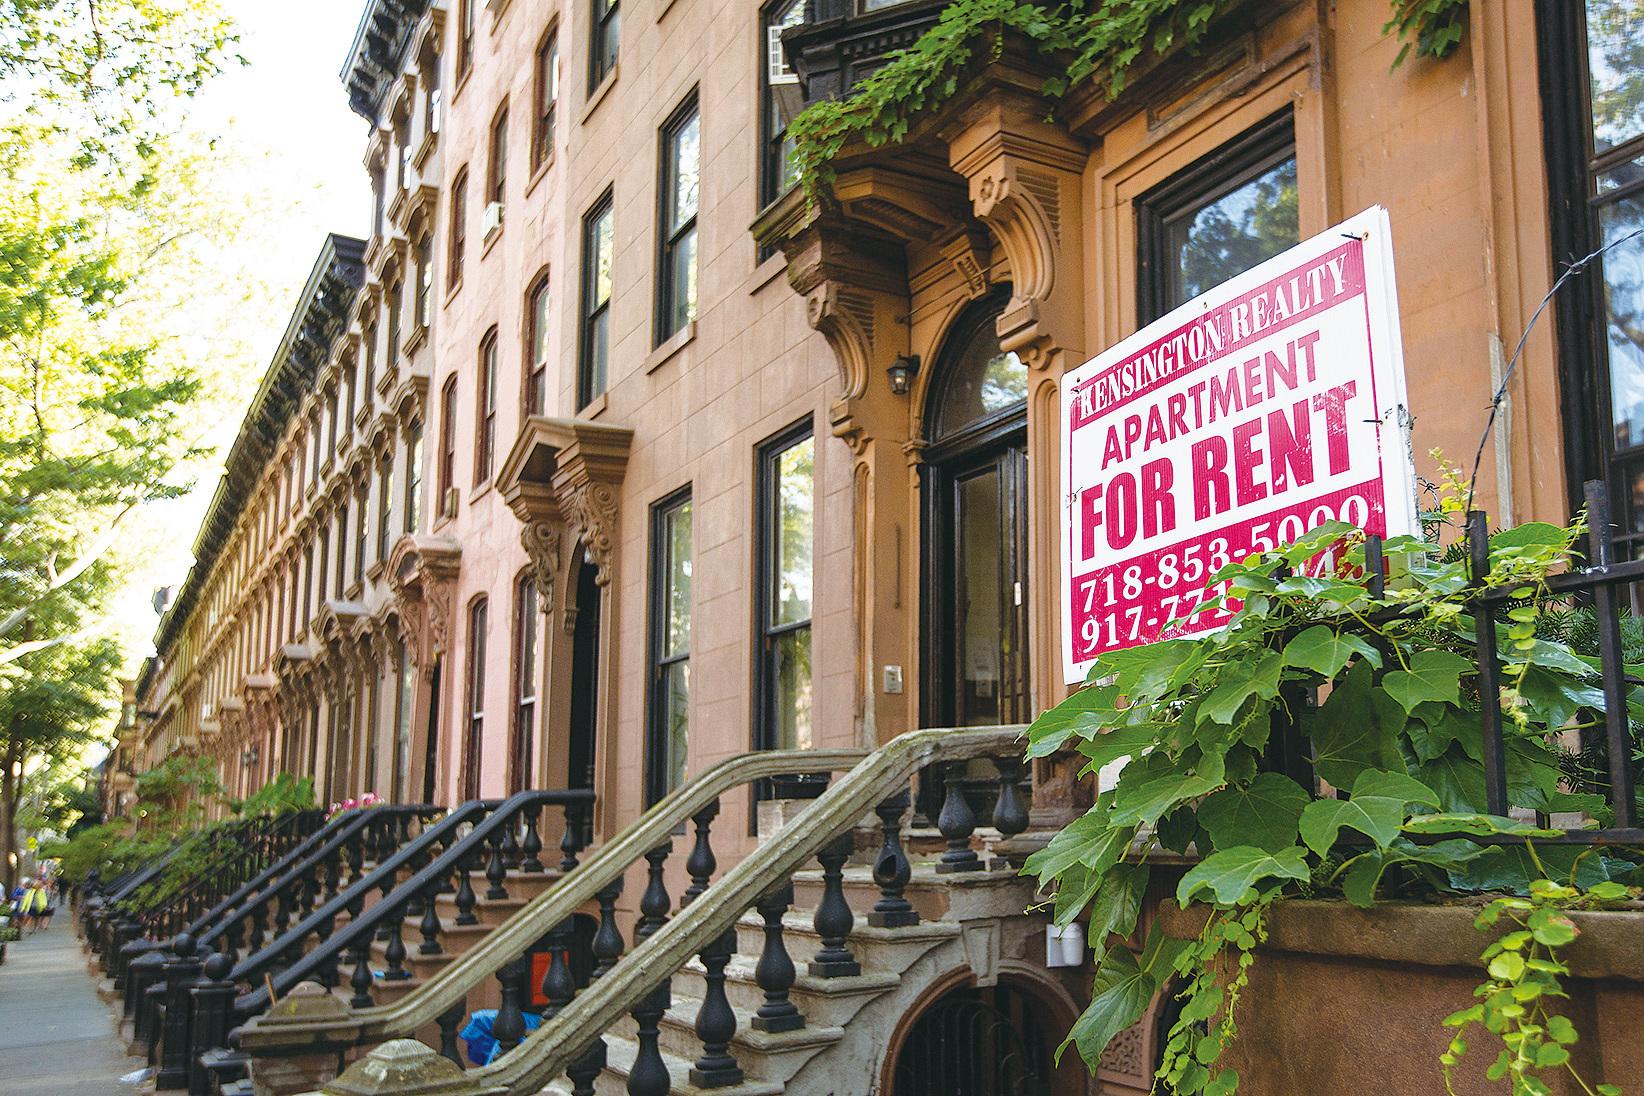 布碌崙一處待租的公寓。 (Drew Angerer/Getty Images)